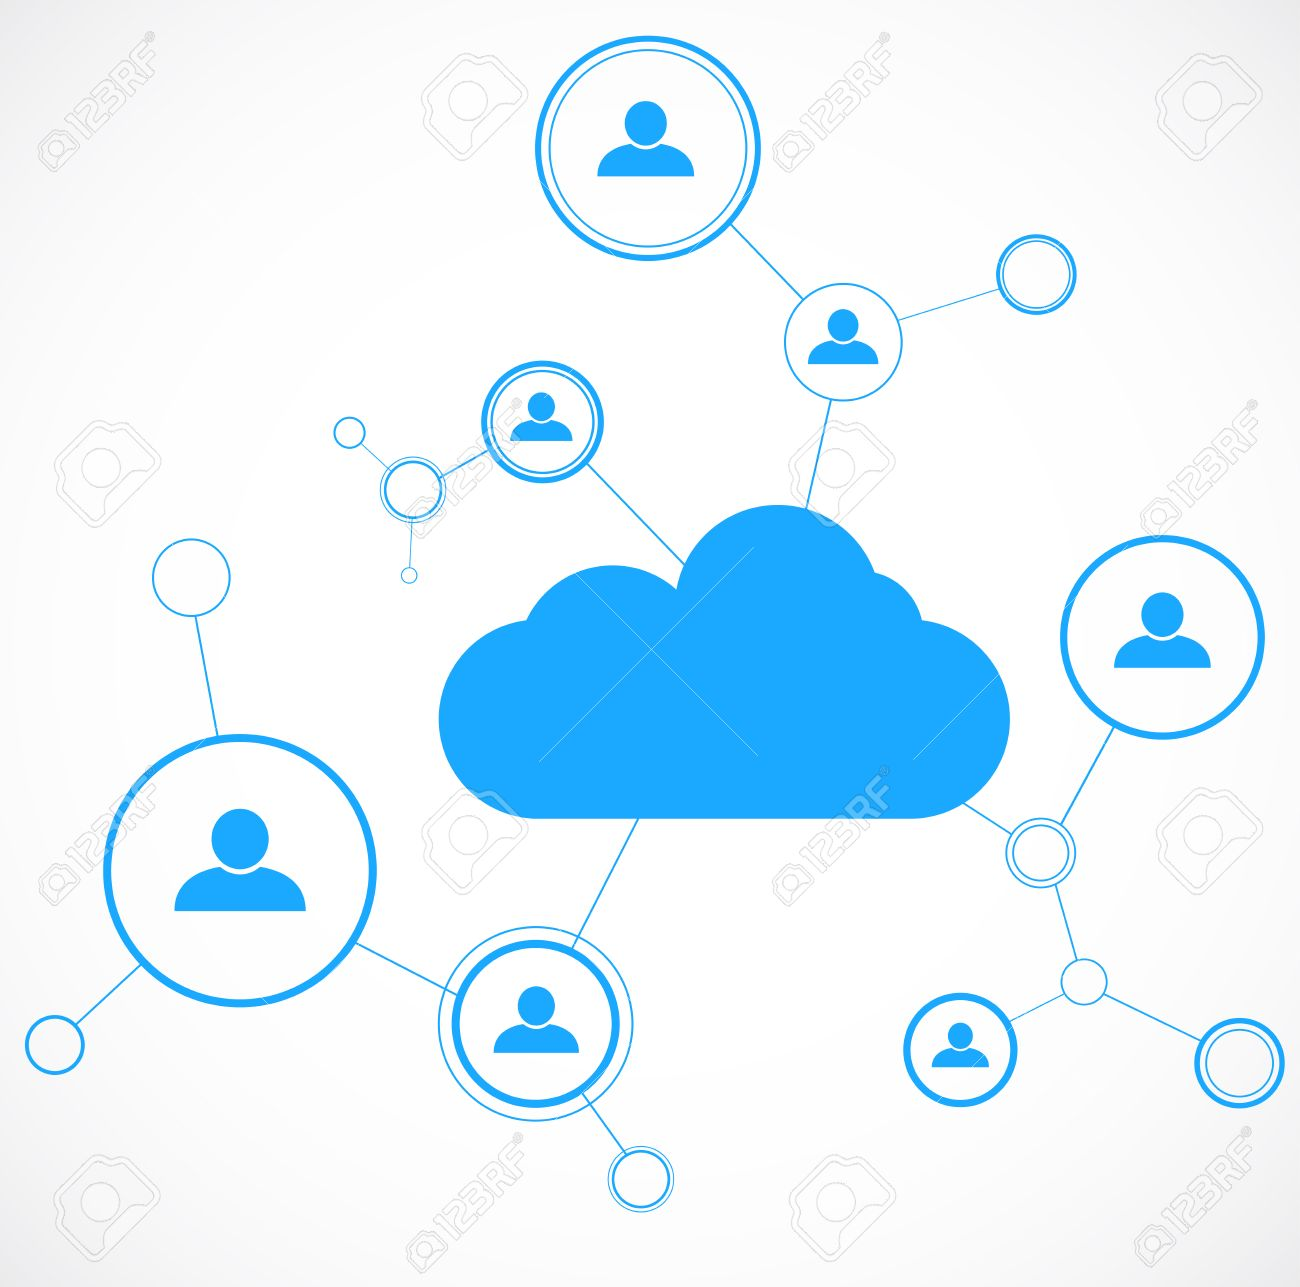 network concept cloud technolgy social networking design template